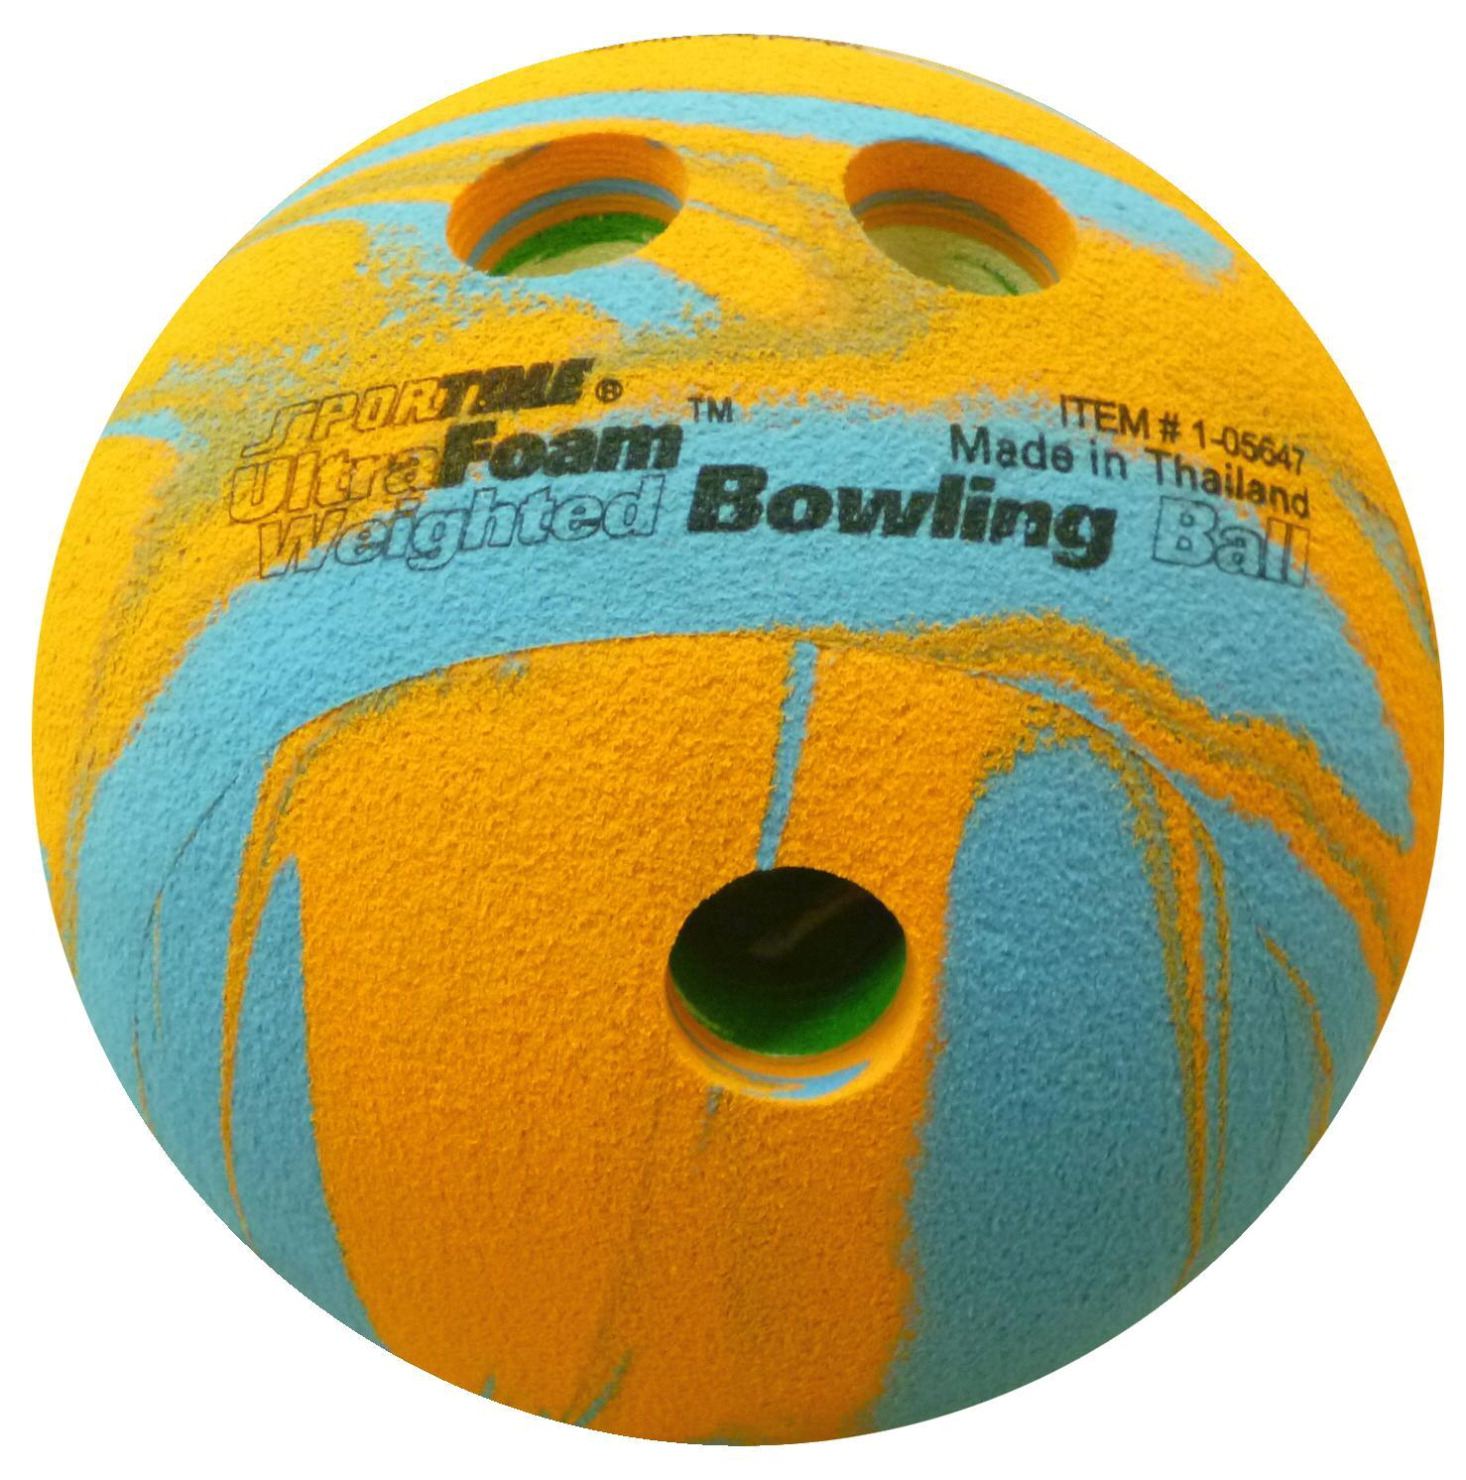 Sportime UltraFoam Weighted Bowling Ball, 6.75